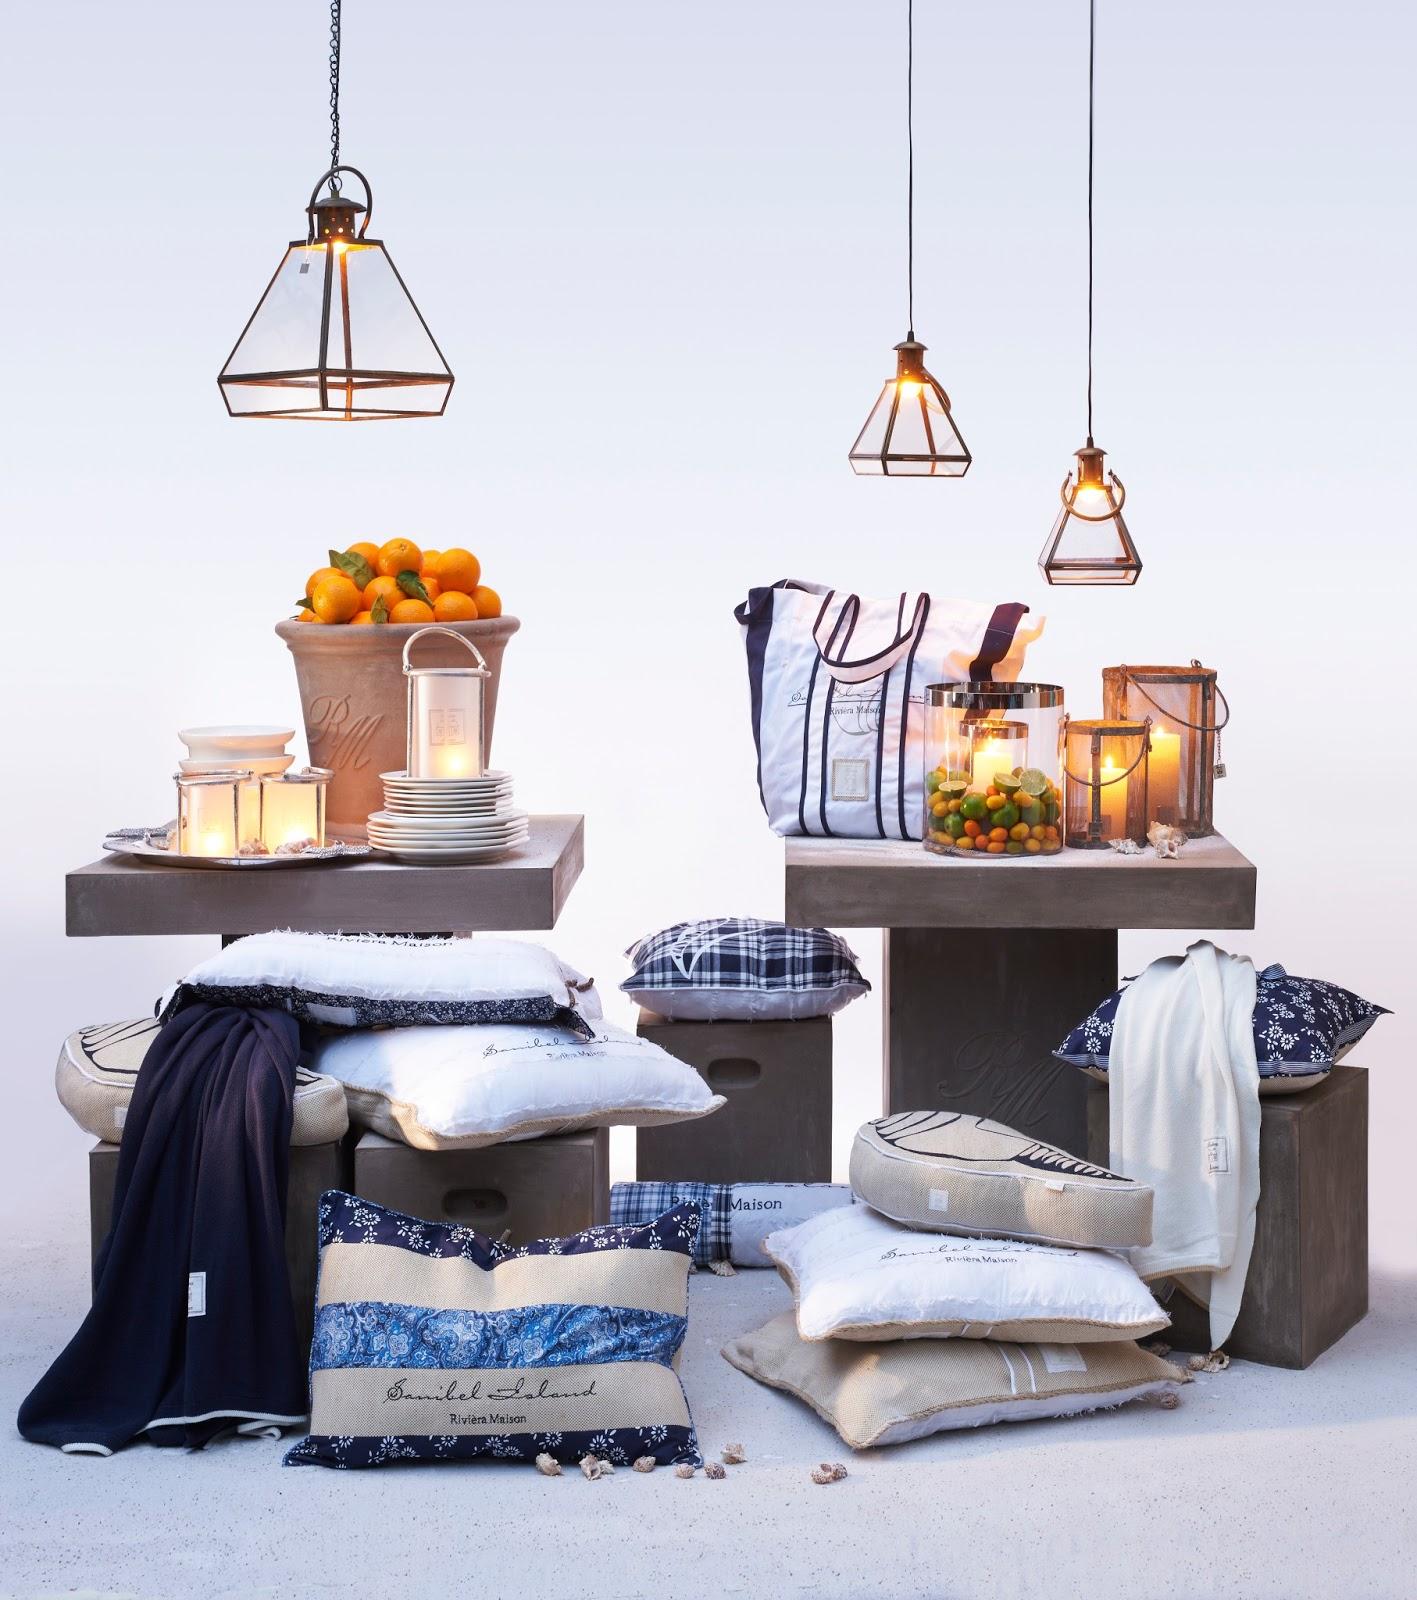 rmnorge meatpacking district hanging lamp. Black Bedroom Furniture Sets. Home Design Ideas